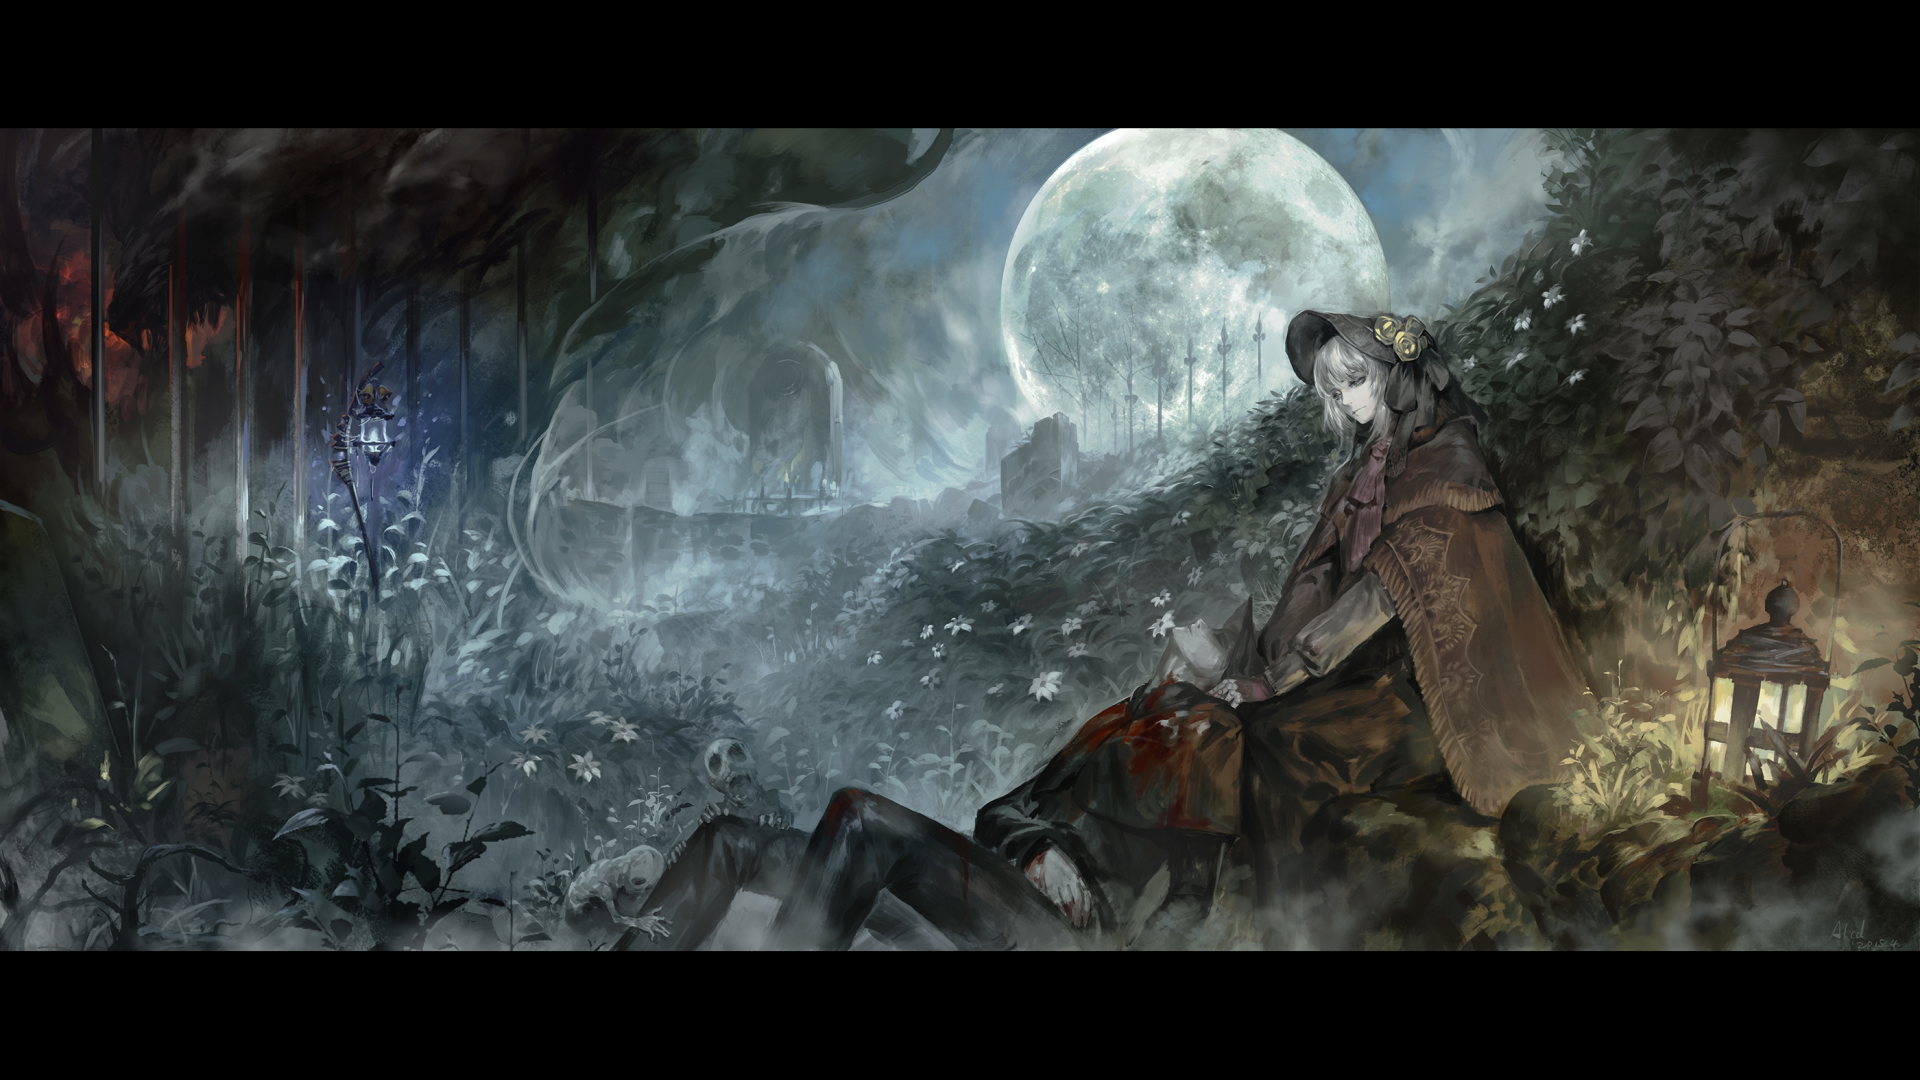 Video Game Bloodborne Hunter Moon Plain Doll Wallpaper Bloodborne Art Bloodborne Dark Souls